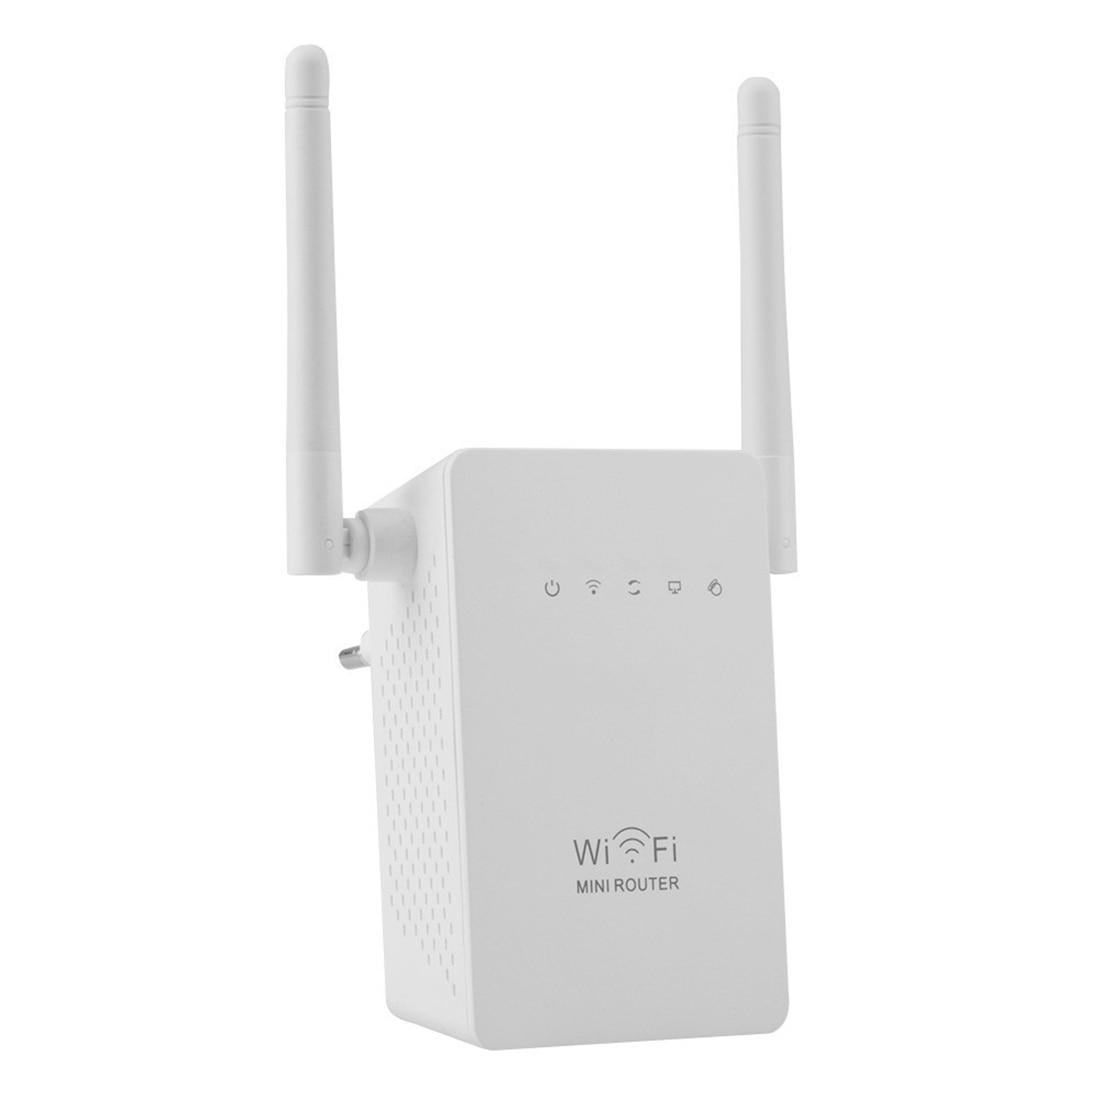 NOYOKERE nuevo 300 Mbps WiFi repetidor Red Range Extender Booster N300 único aumento antenas externas dobles EU US enchufe